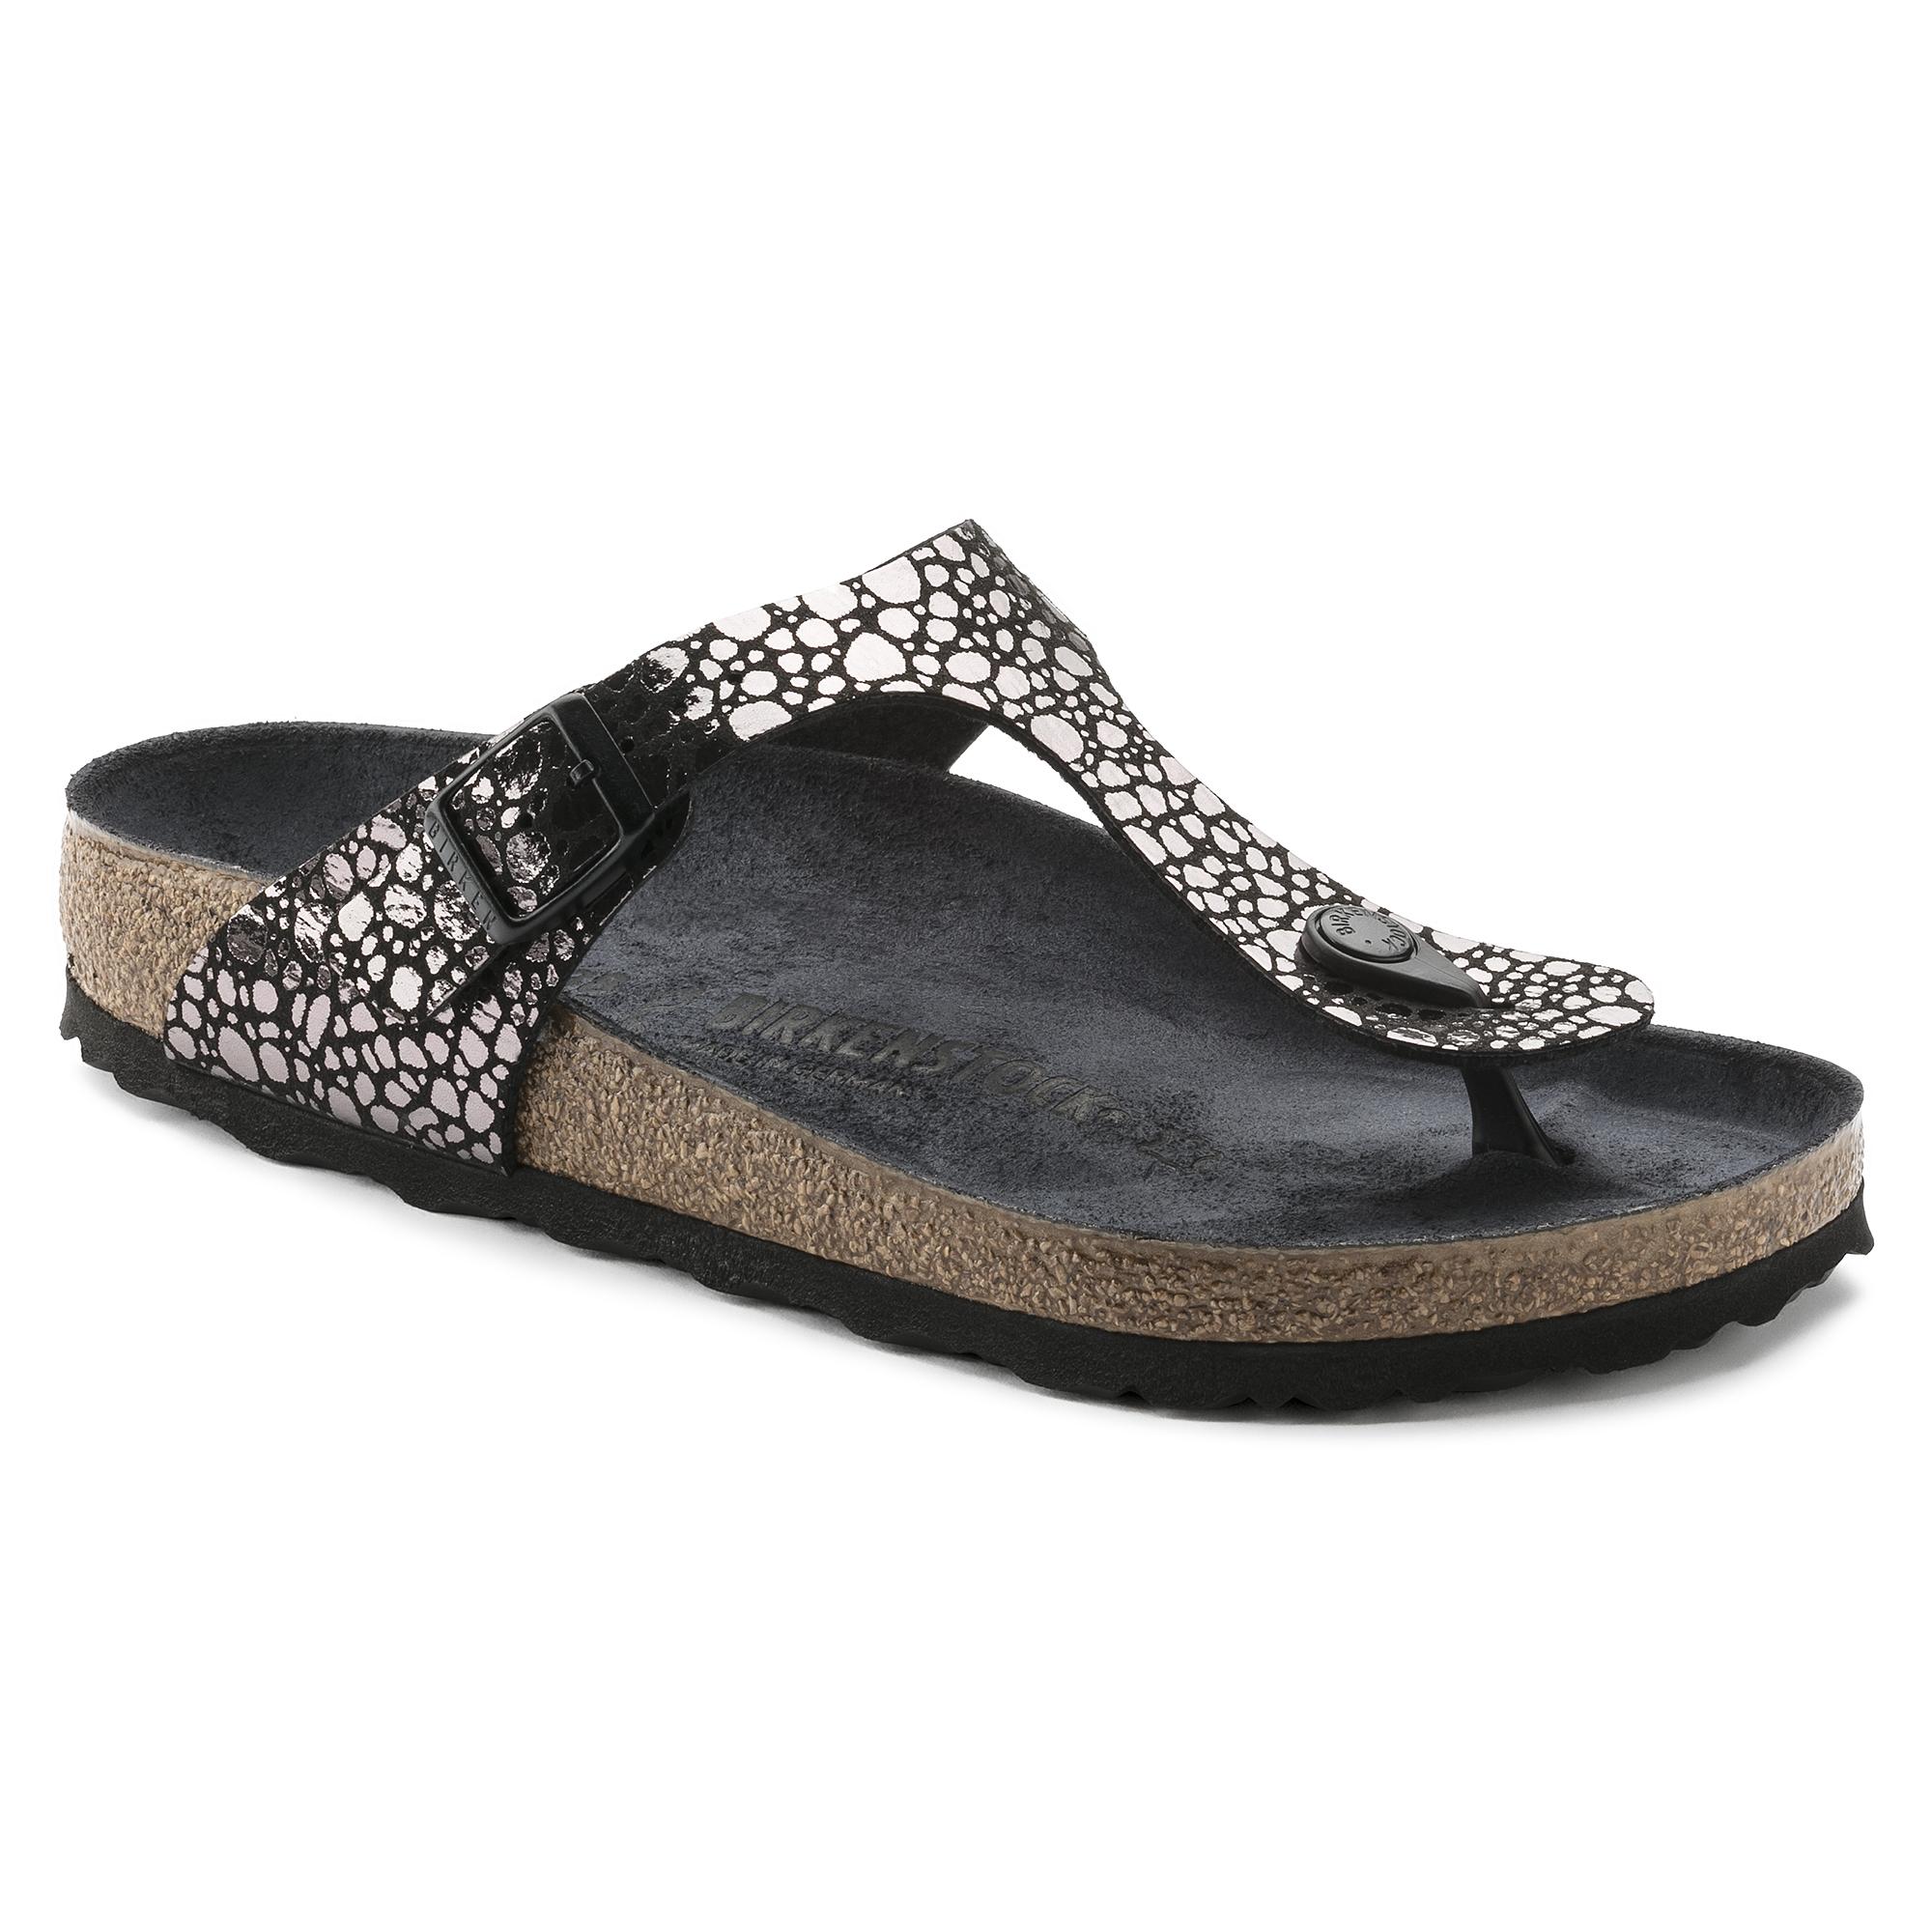 8969b66d4e1f15 Gizeh Birko-Flor Metallic Stones Black